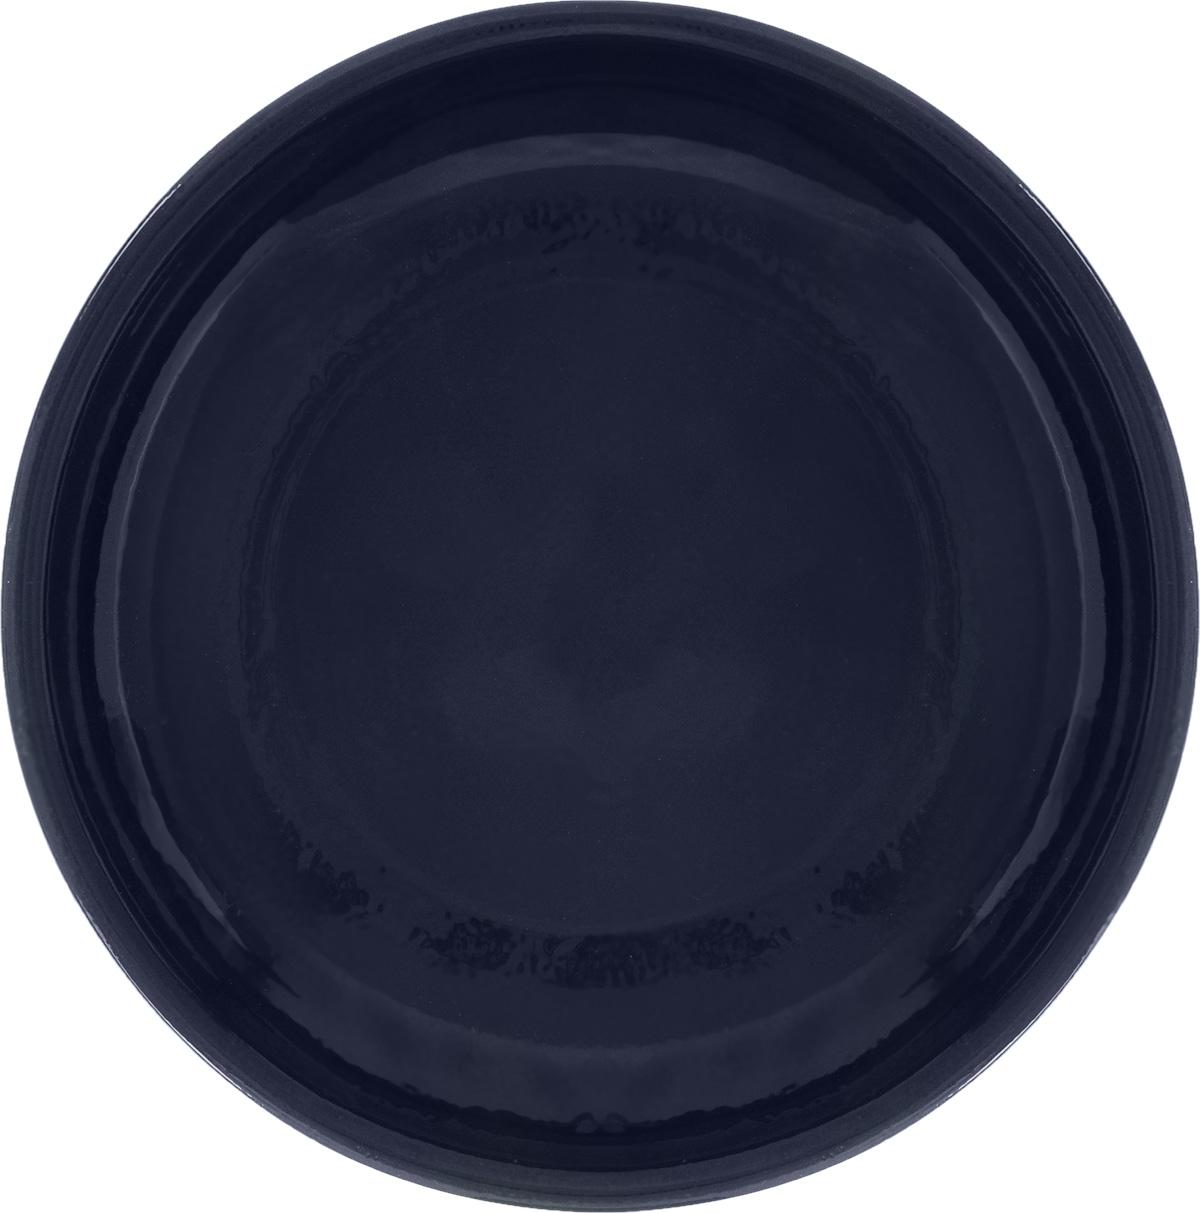 "Тарелка Борисовская керамика ""Радуга"", цвет: темно-синий, диаметр 18 см"